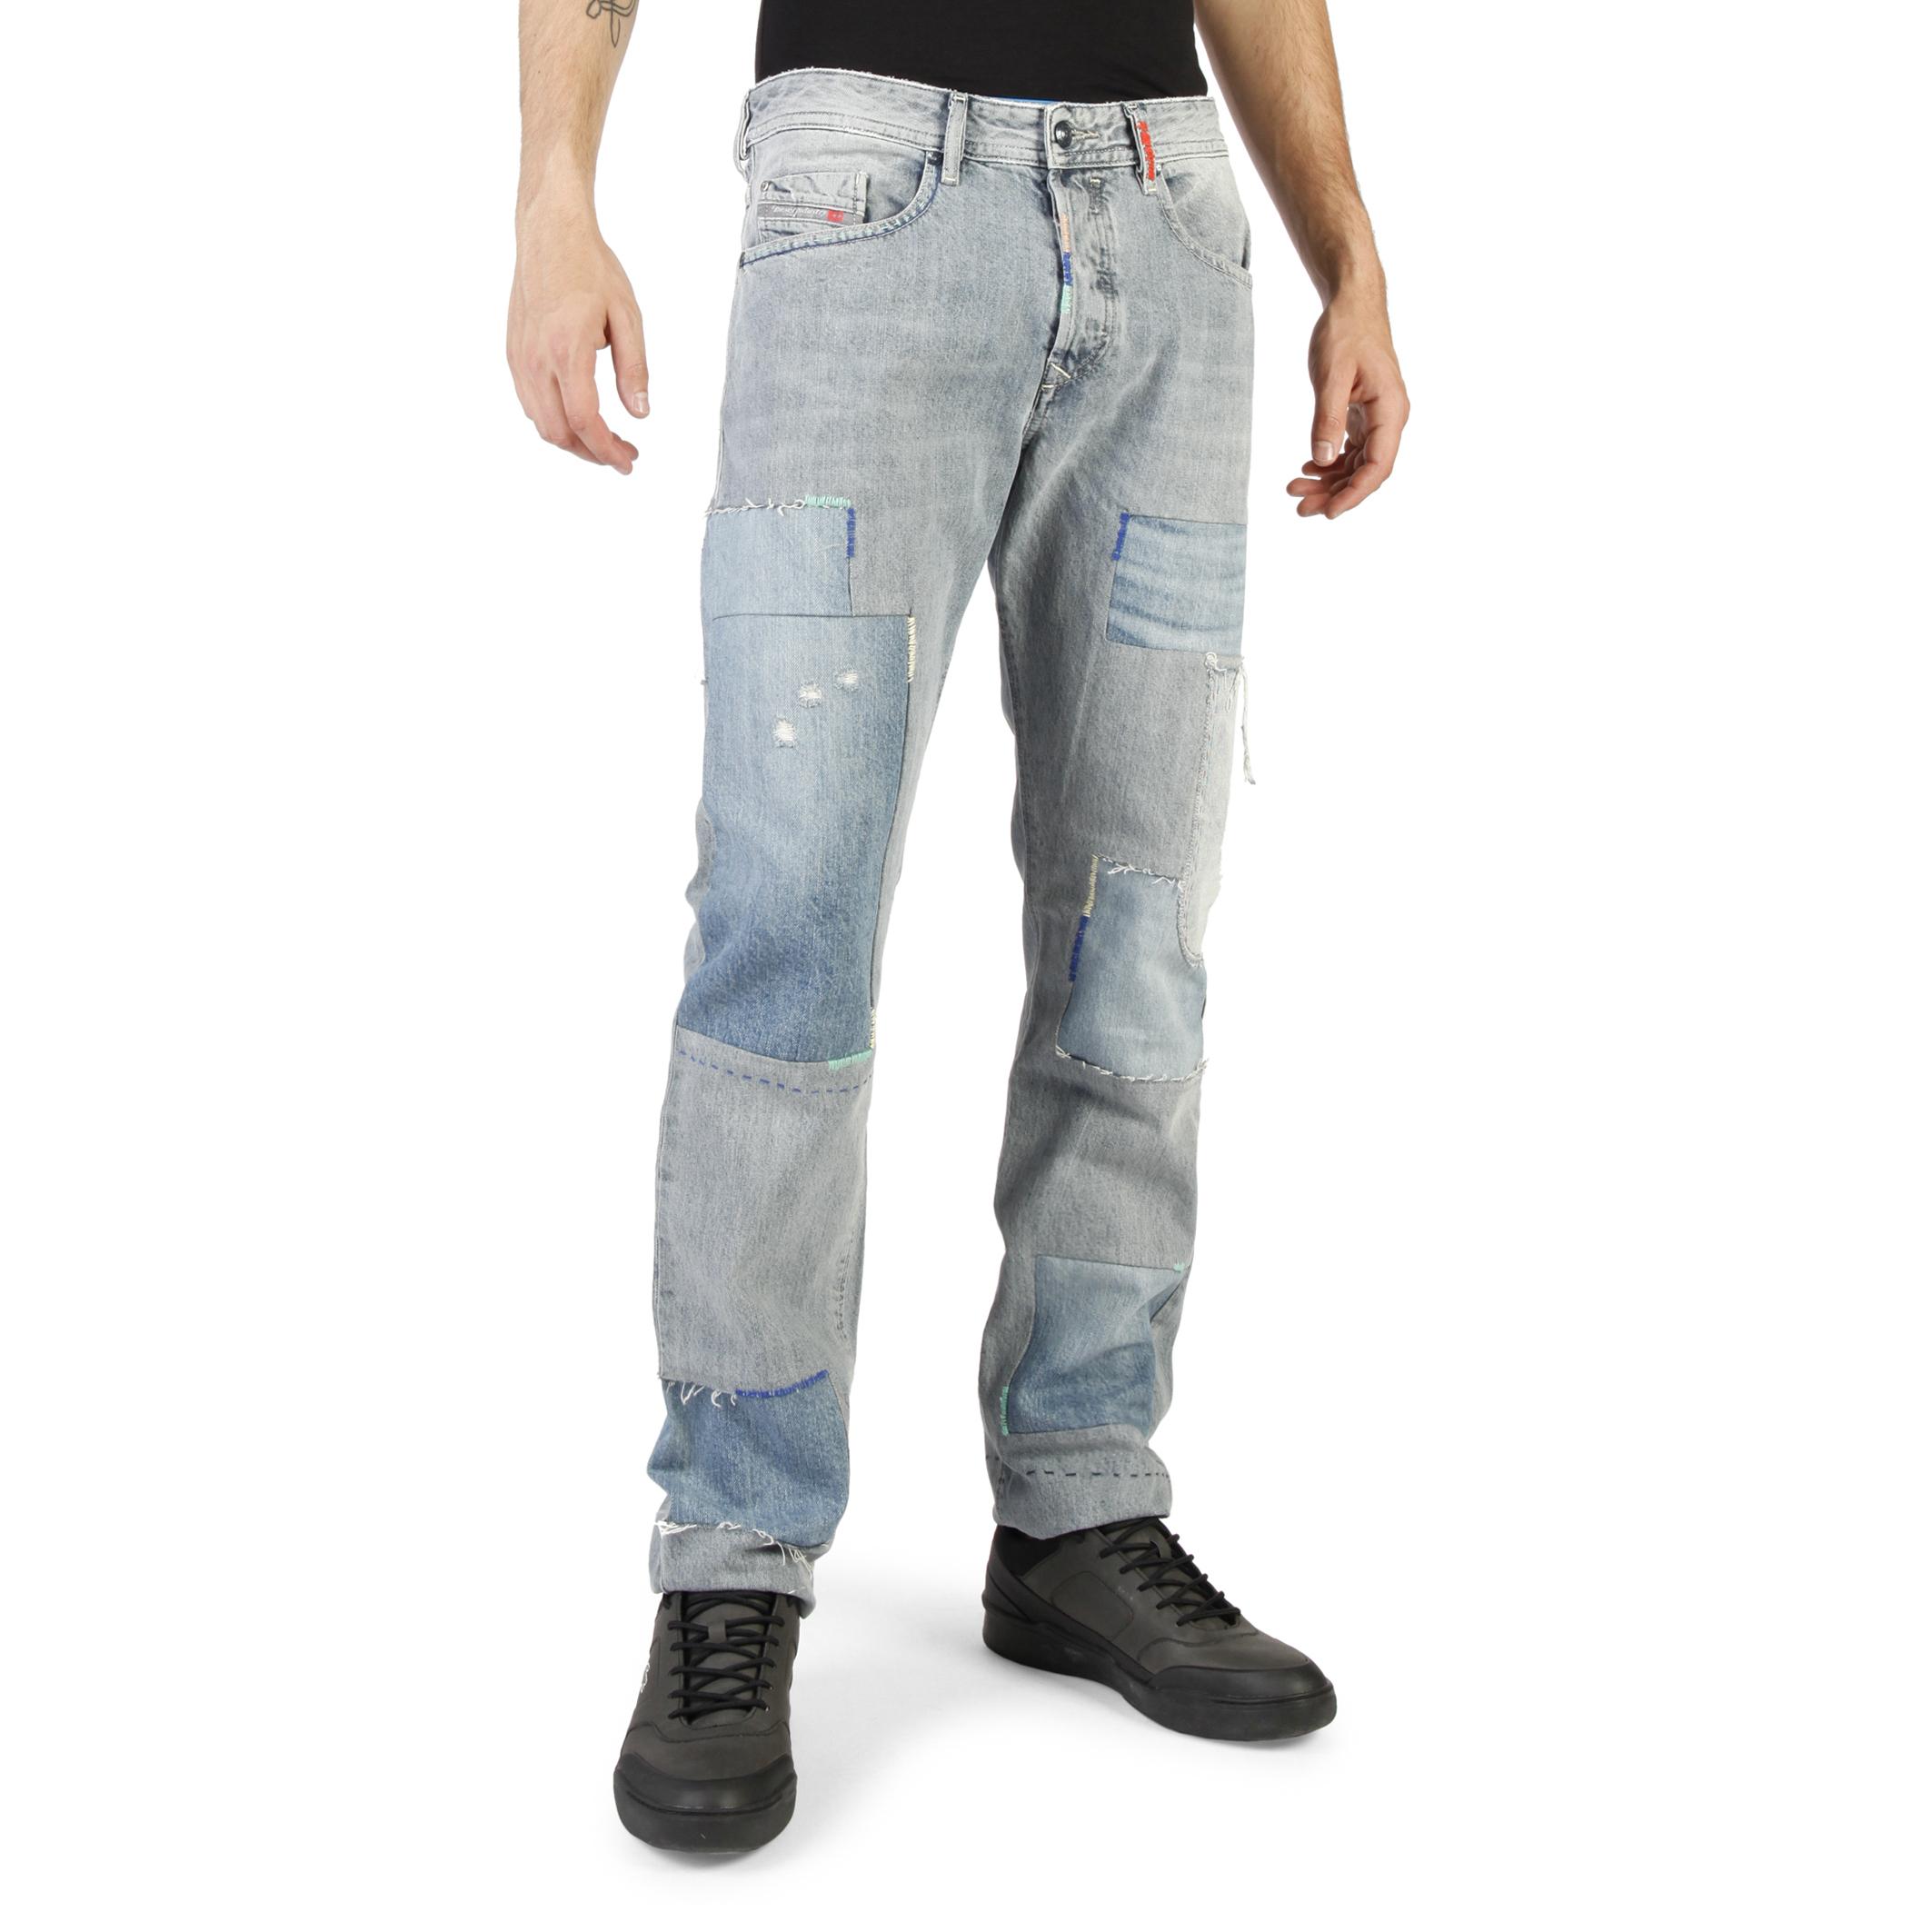 Jeans Diesel BUSTER_L32_00SDHB Uomo Blu 91459